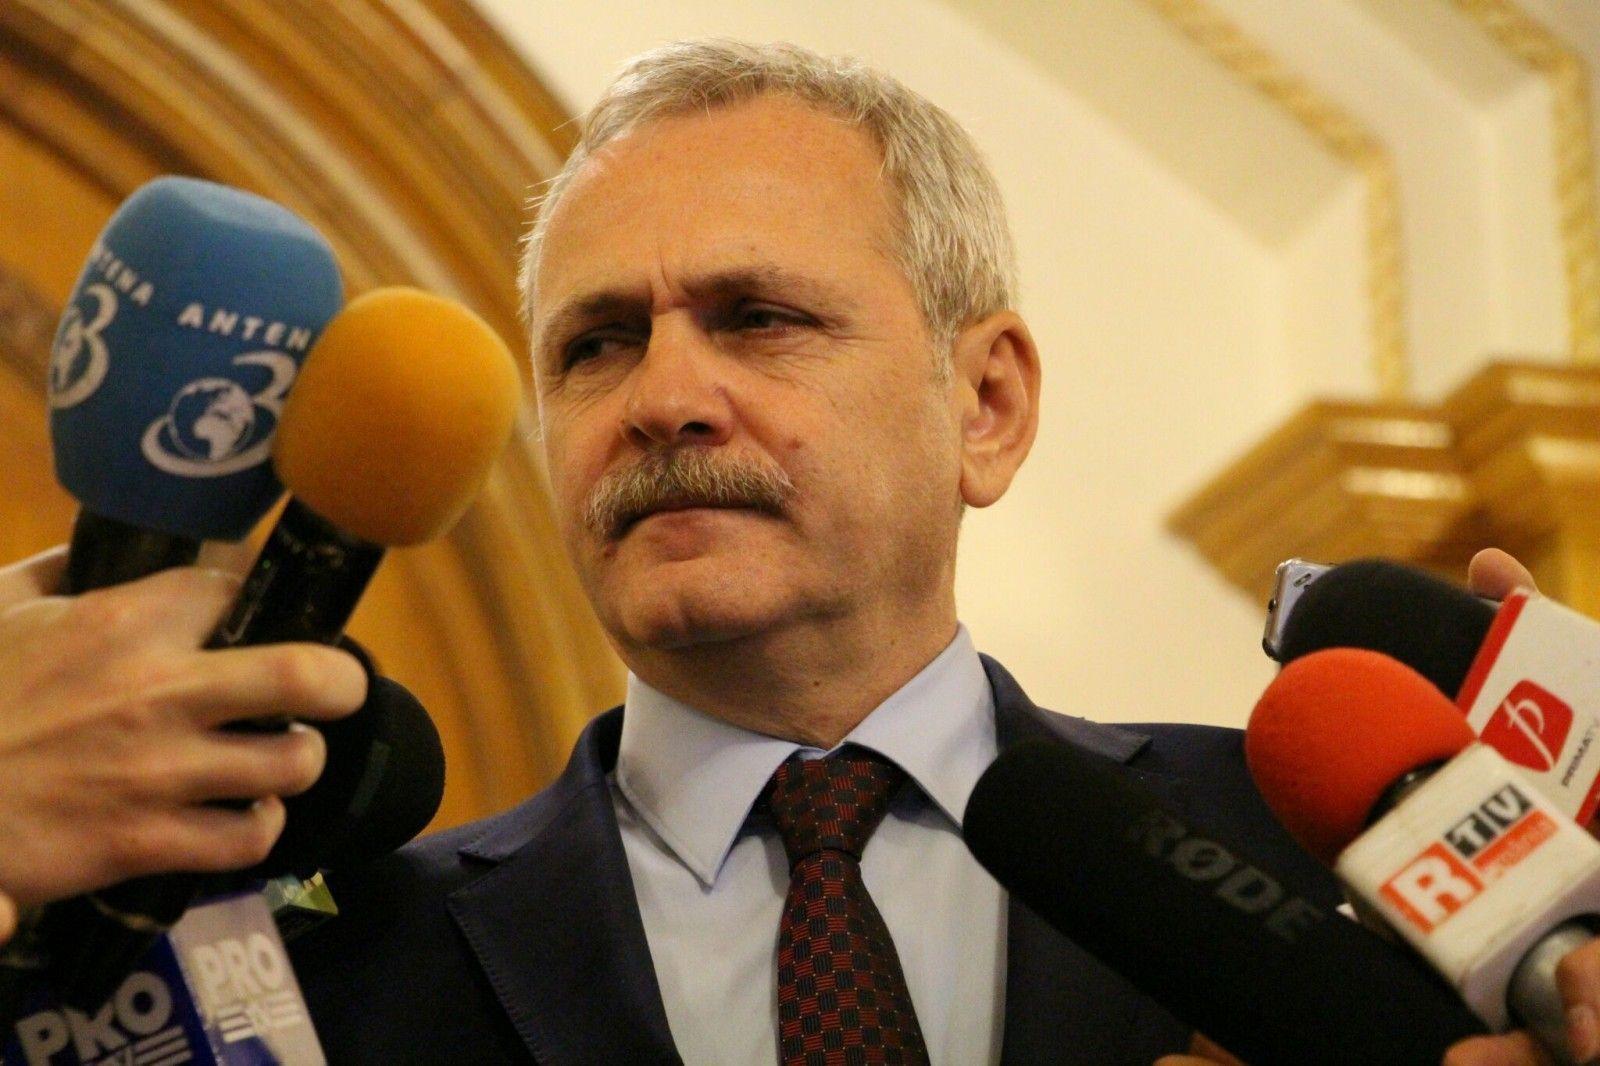 Dragnea warns of unknown developments if Iohannisdoesn't dismiss DNA head